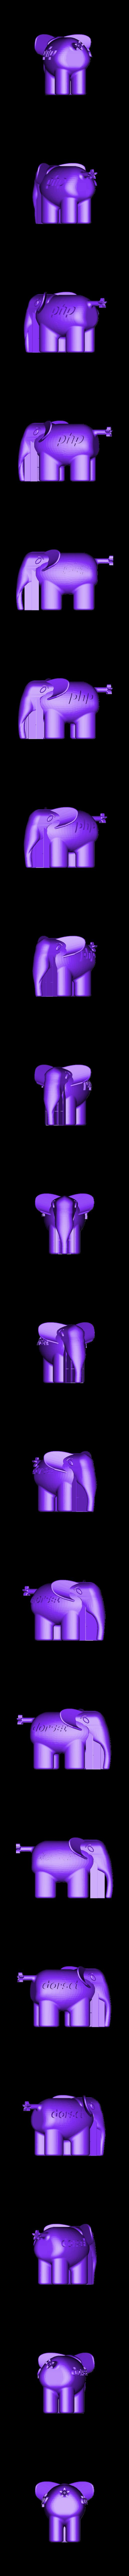 Elephpant.stl Download free STL file elePHPant • 3D print design, Yipham